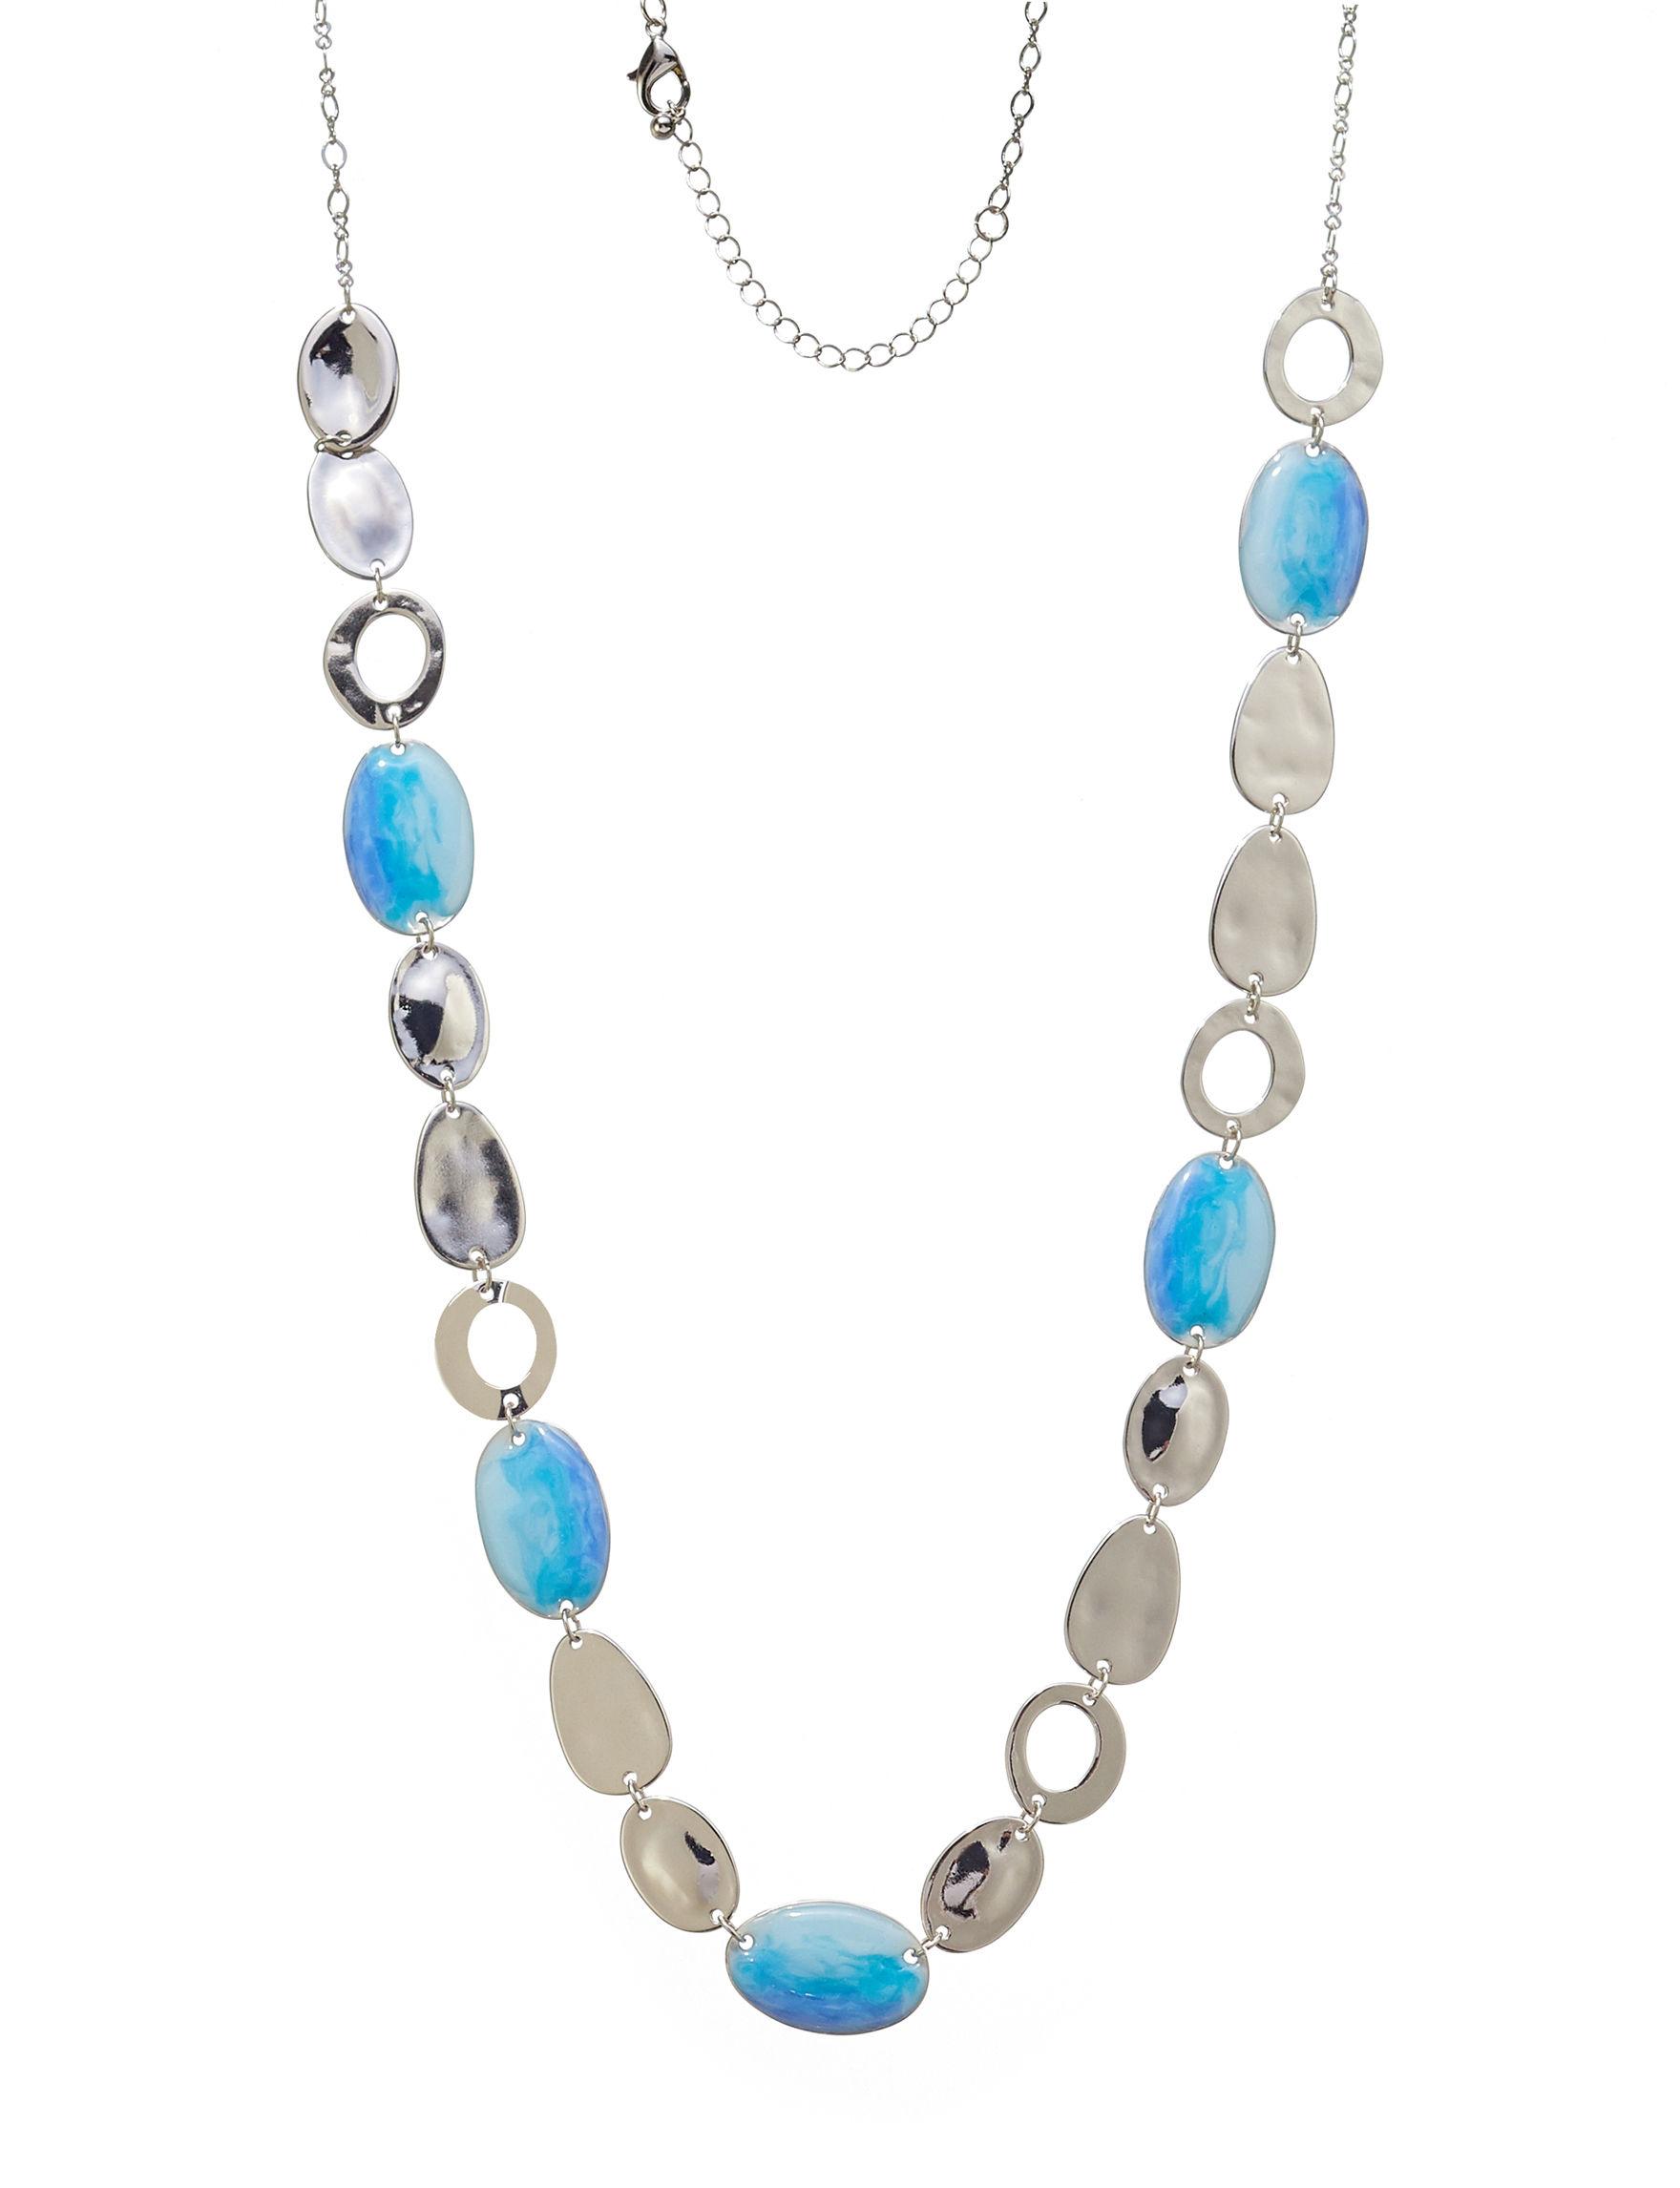 Hannah Blue / Silver Necklaces & Pendants Fashion Jewelry